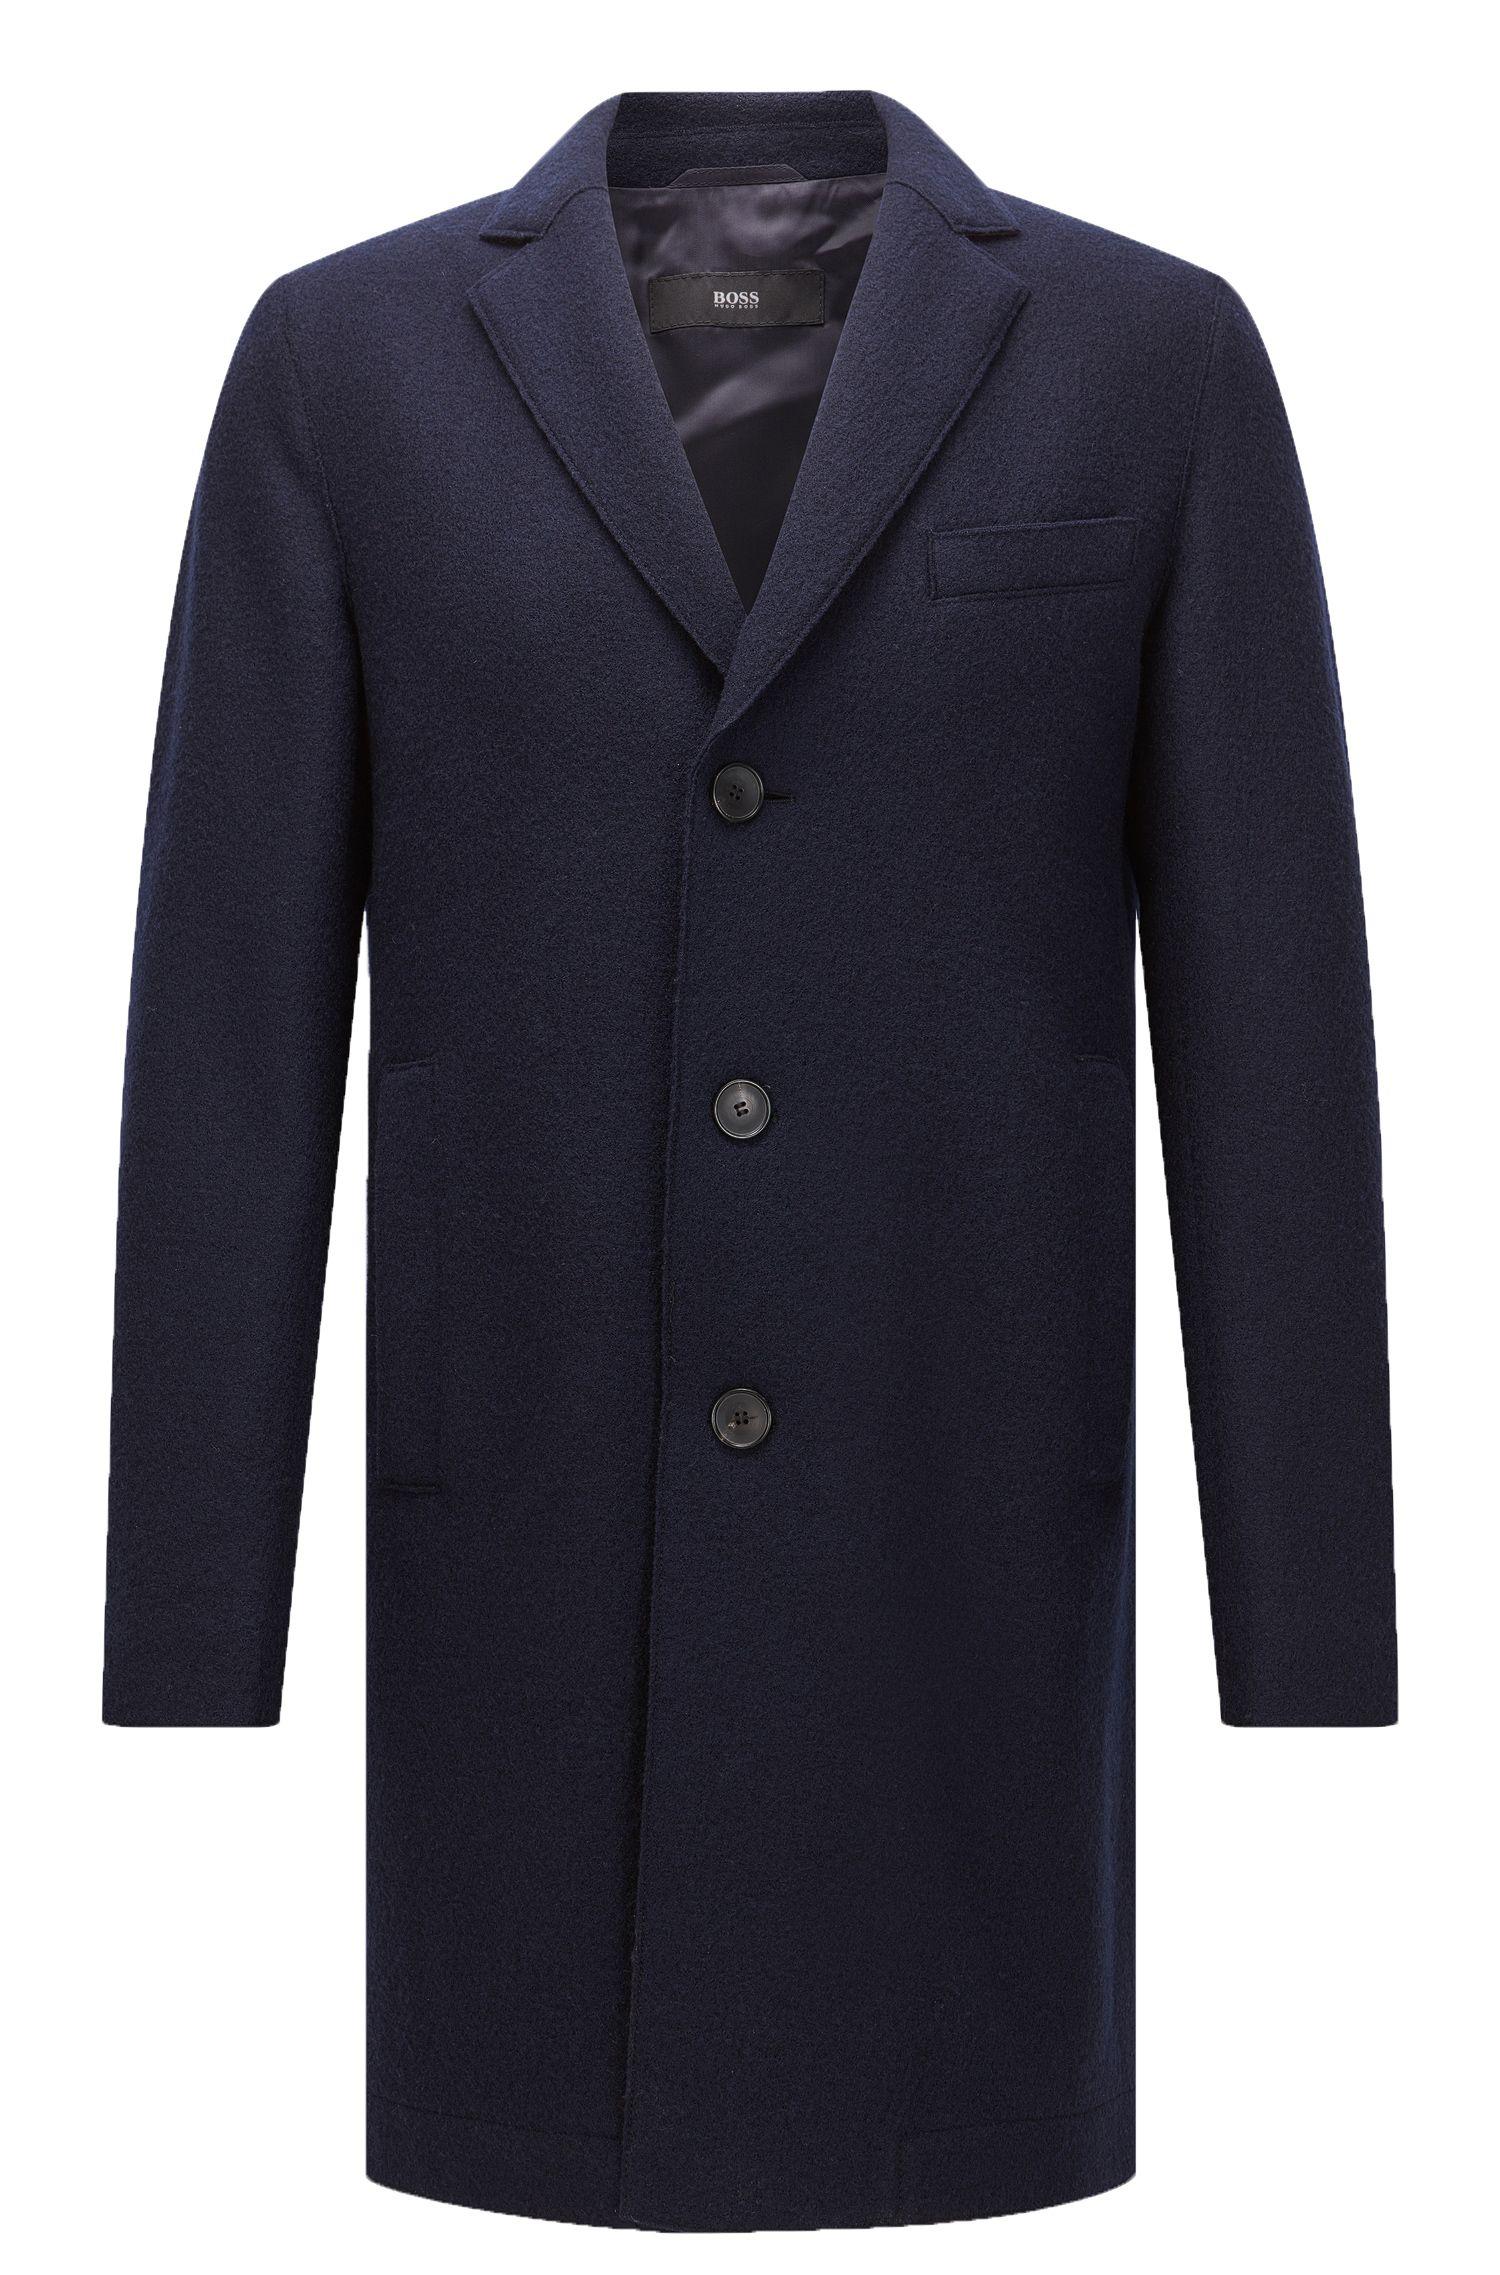 Virgin Wool Coat | Shawn